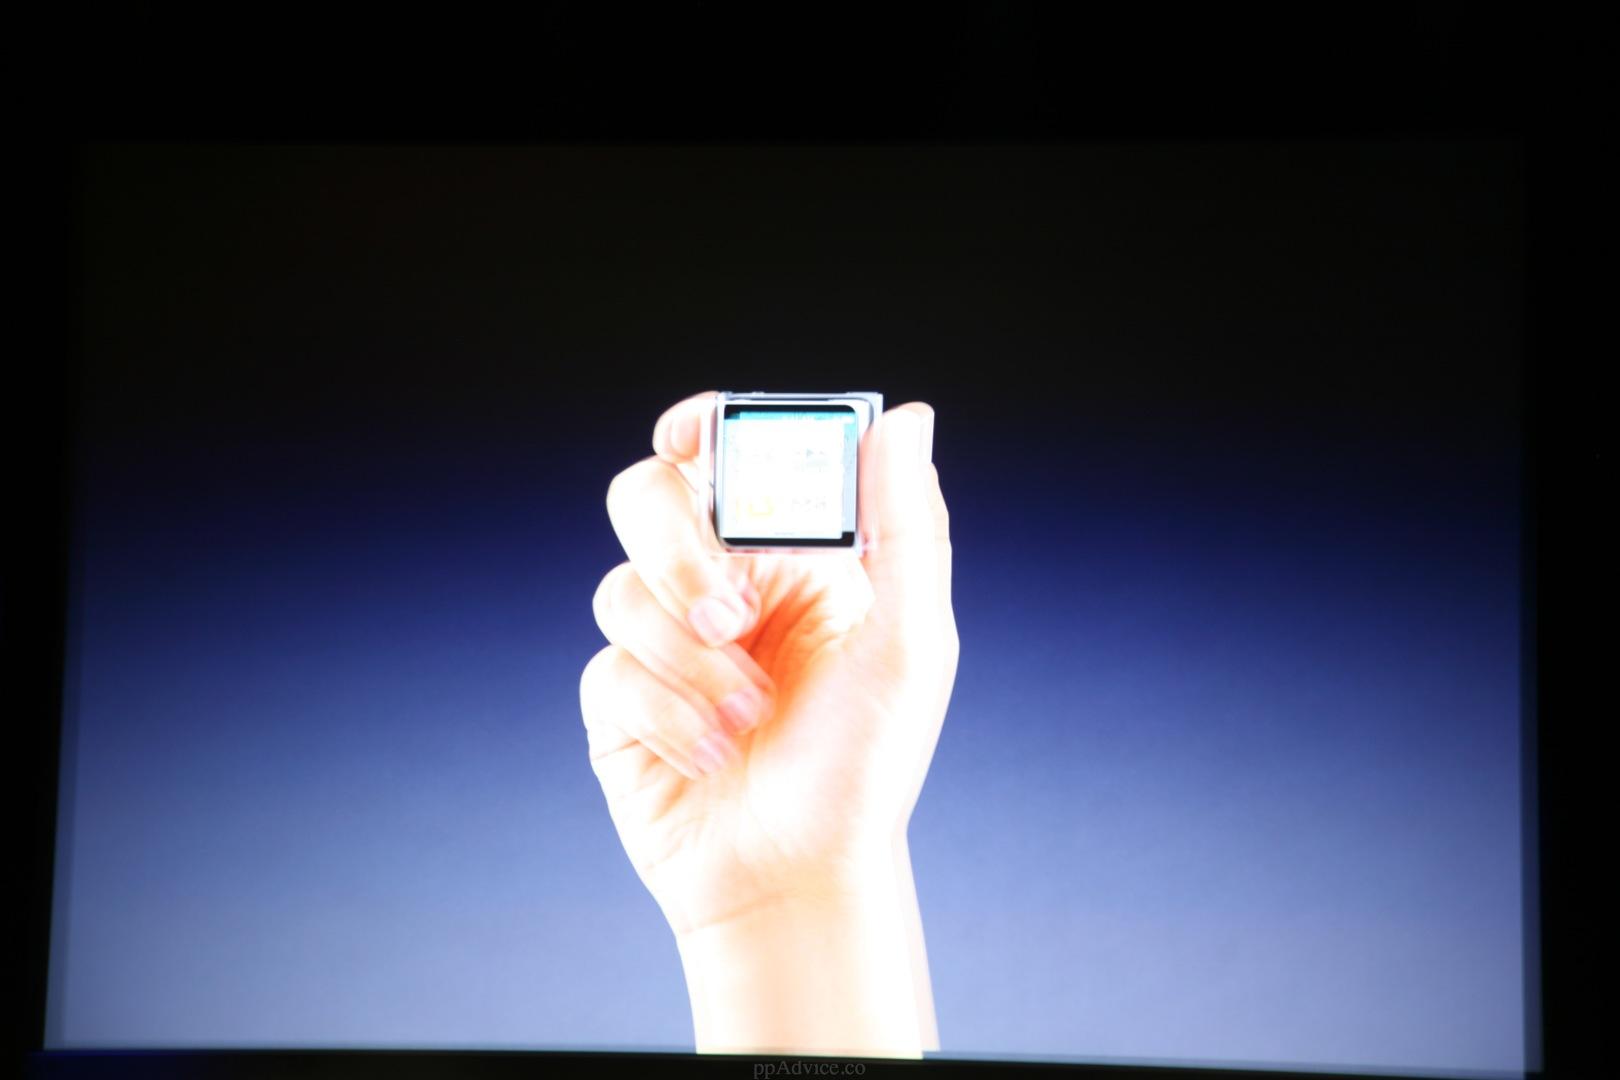 Apple Announces New Touchscreen iPod Nano